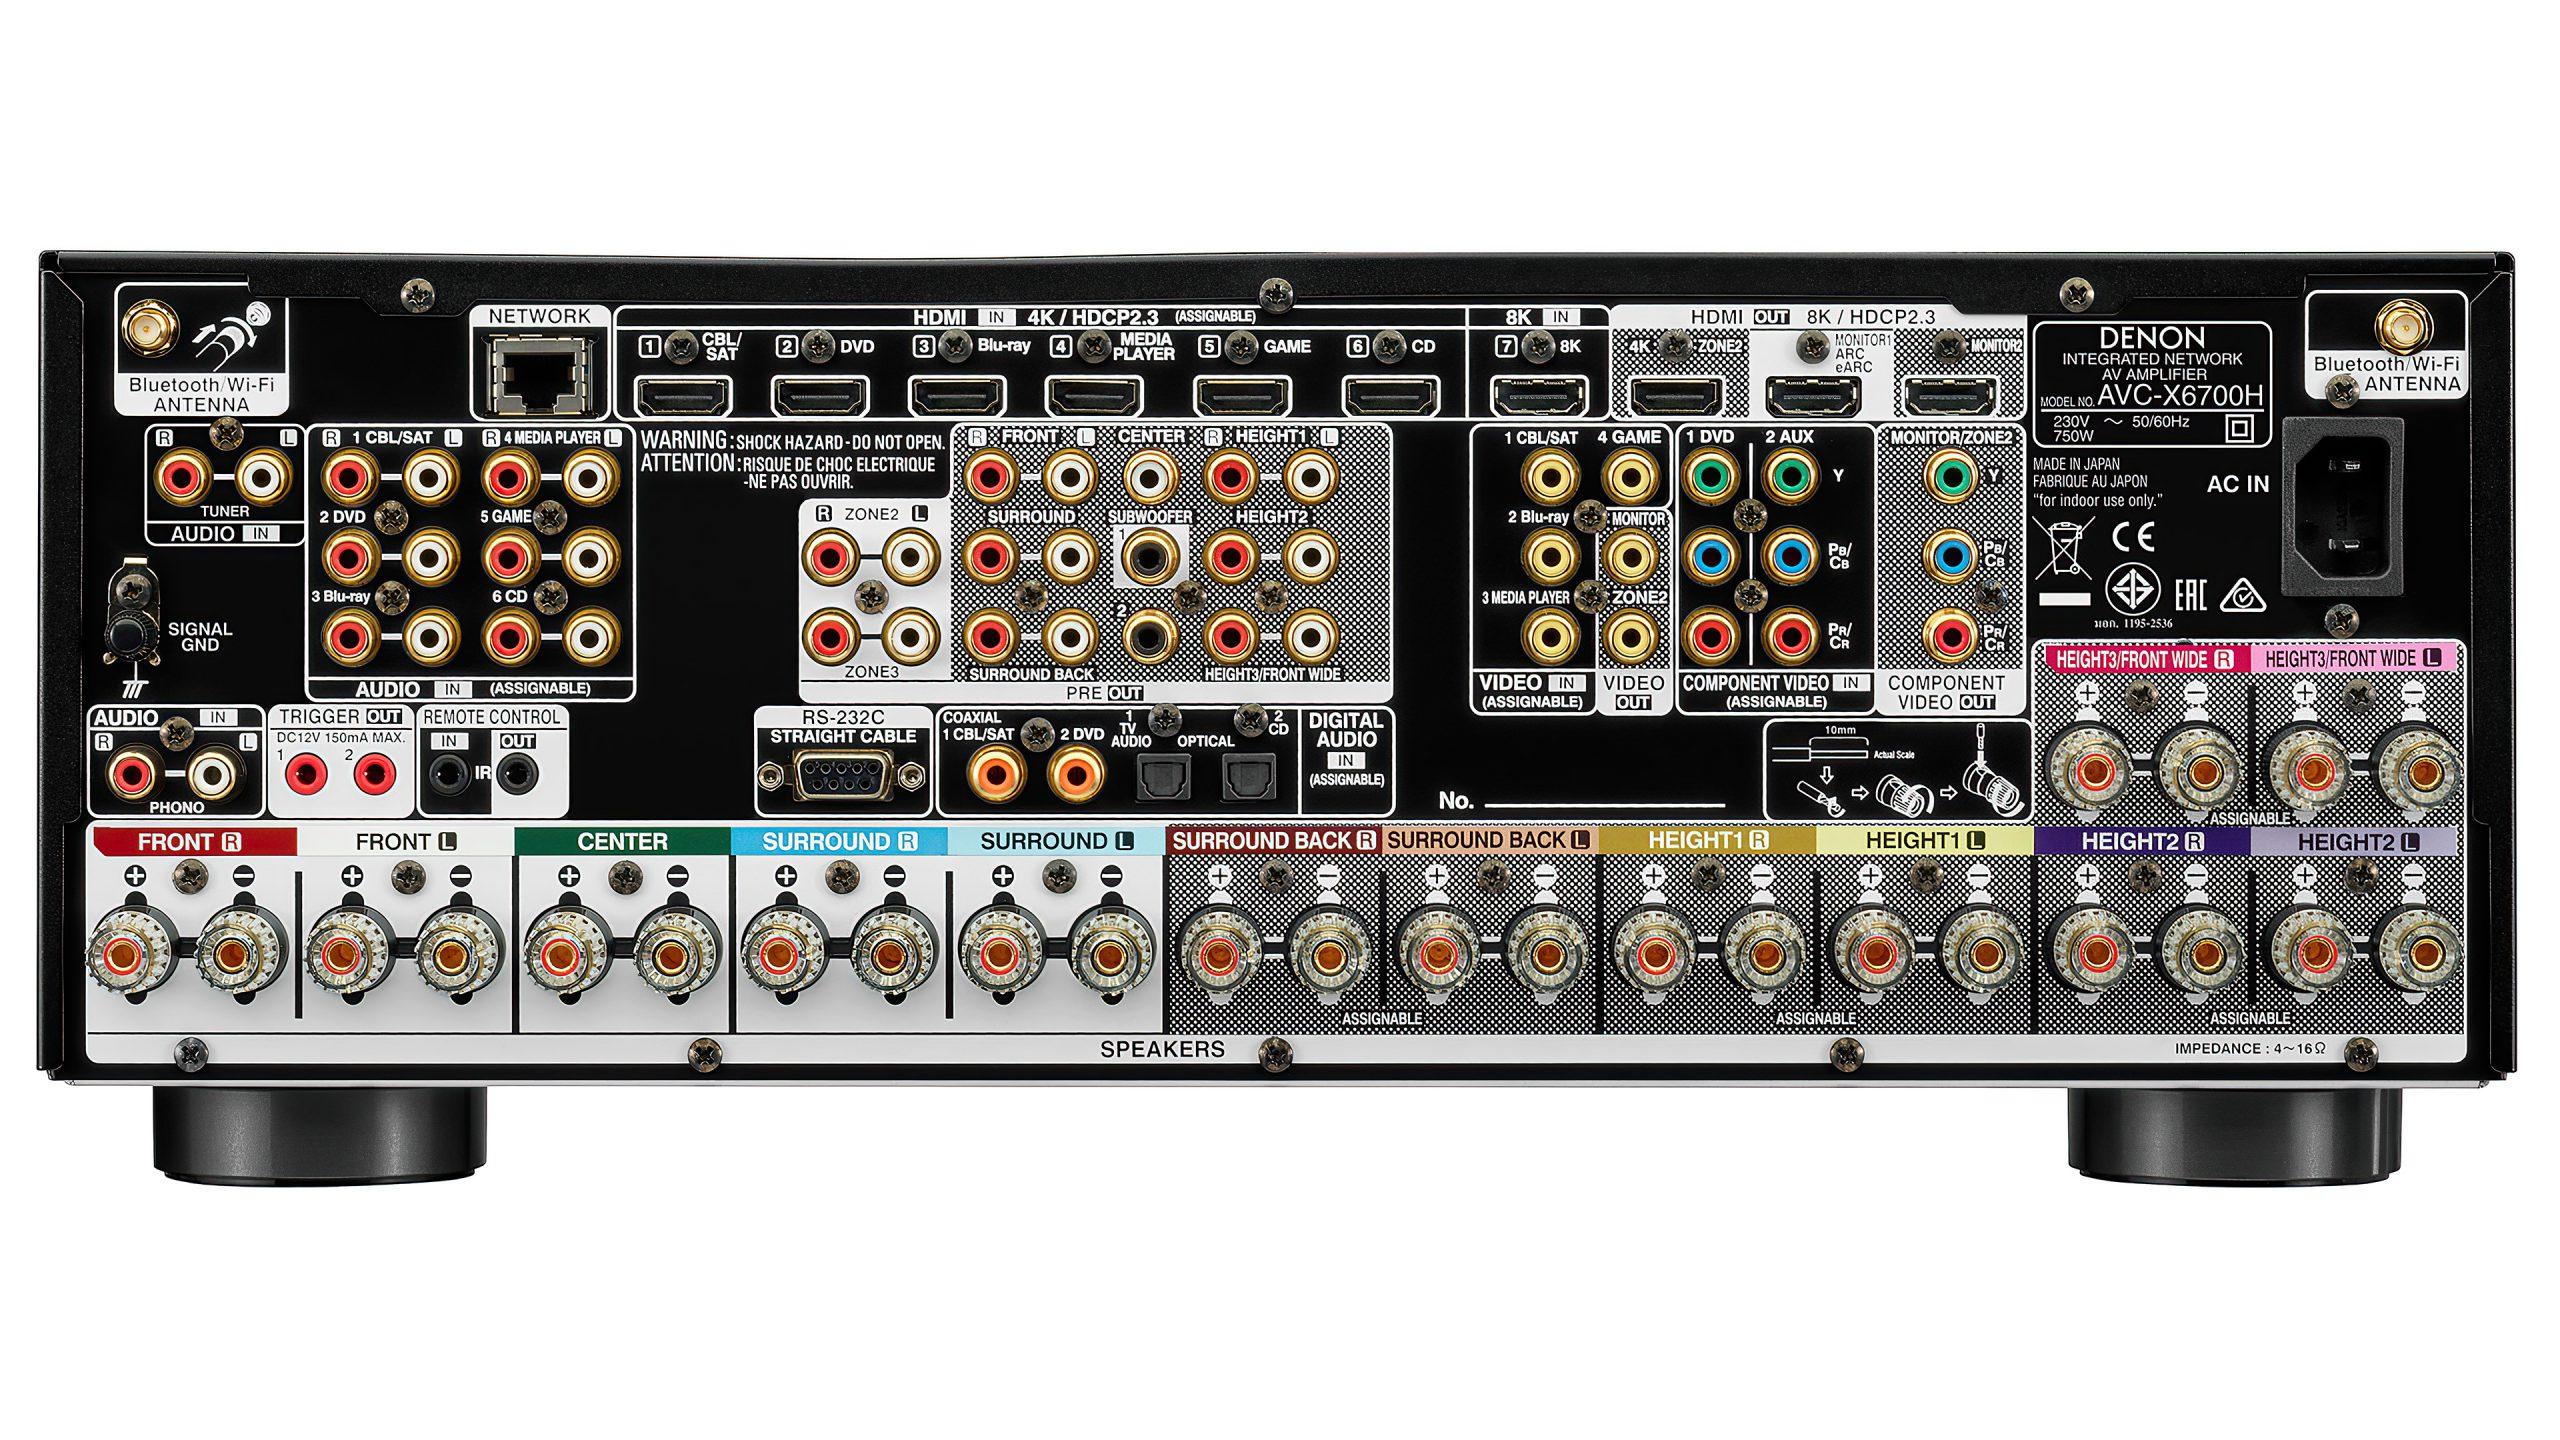 Denon_AVC-X6700H_rear